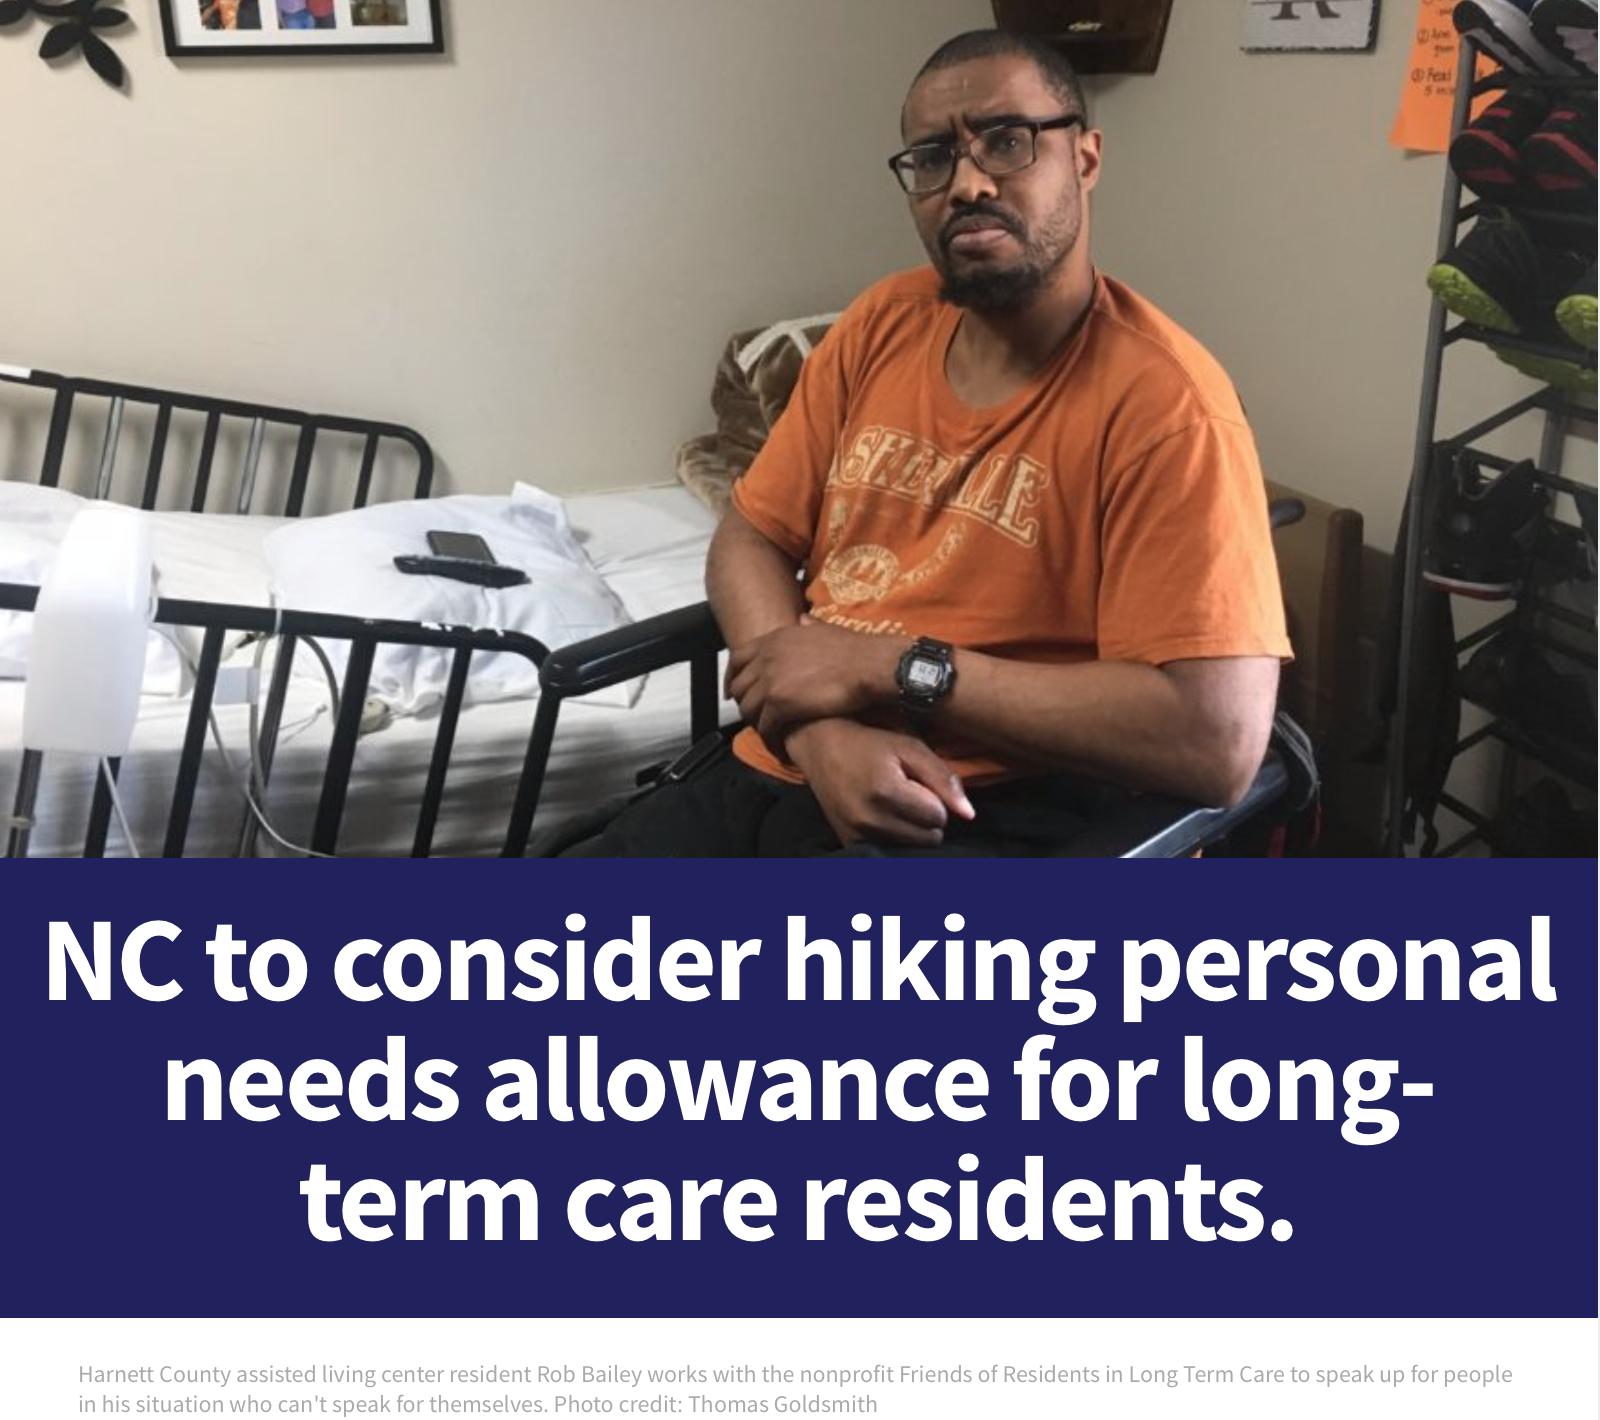 - By Thomas Goldsmith via North Carolina Health News Published February 19, 2019